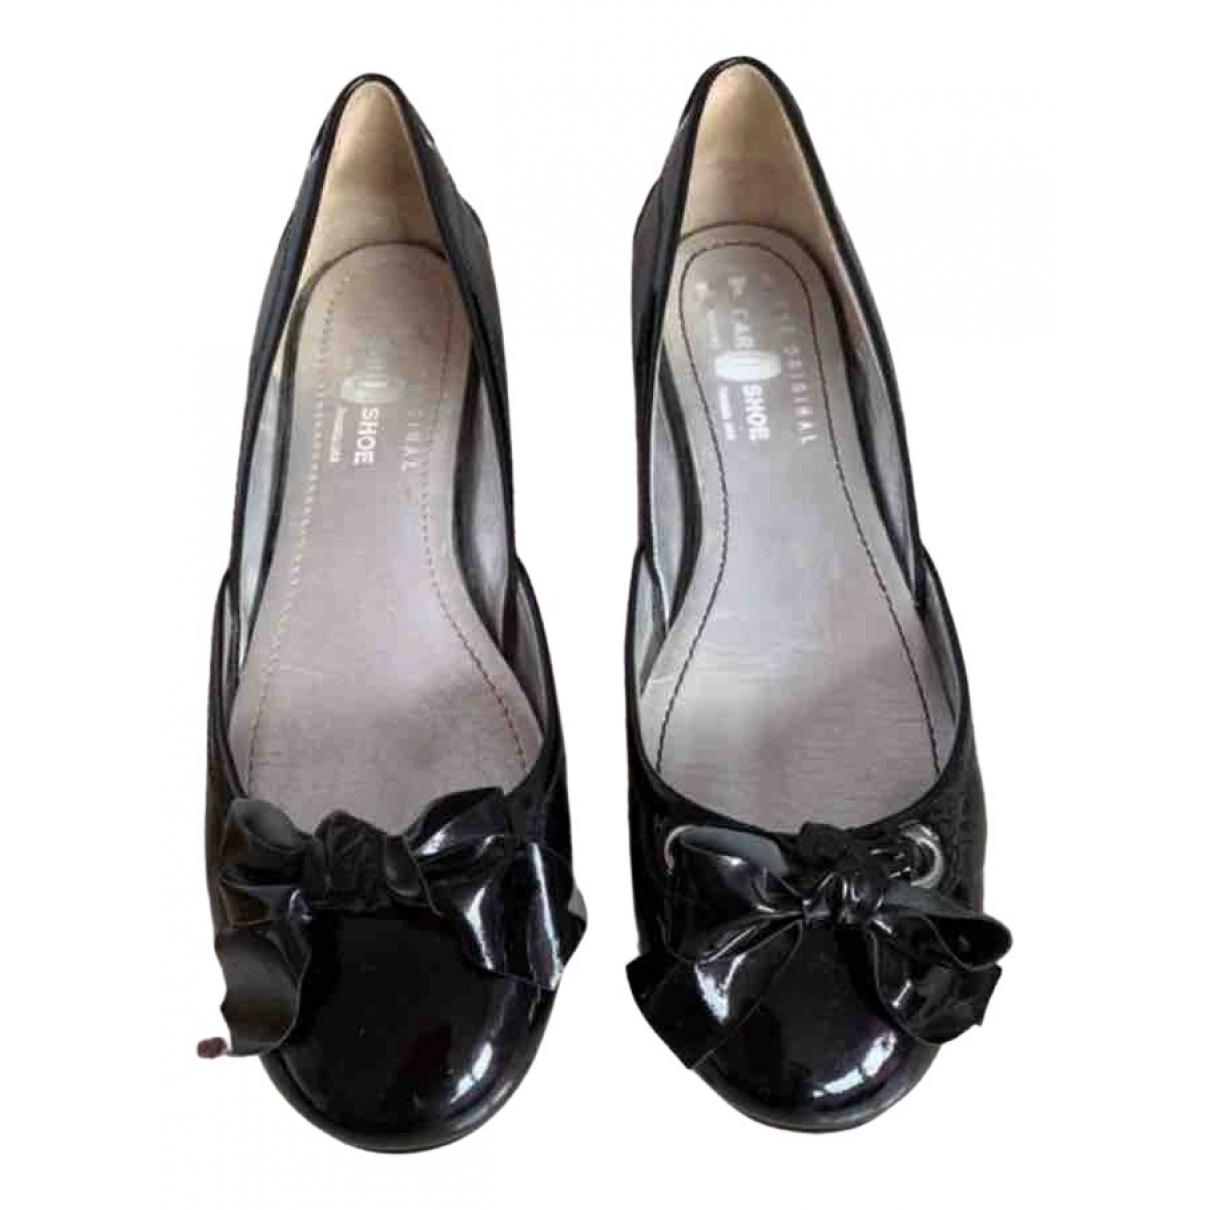 Carshoe \N Black Patent leather Ballet flats for Women 38.5 EU